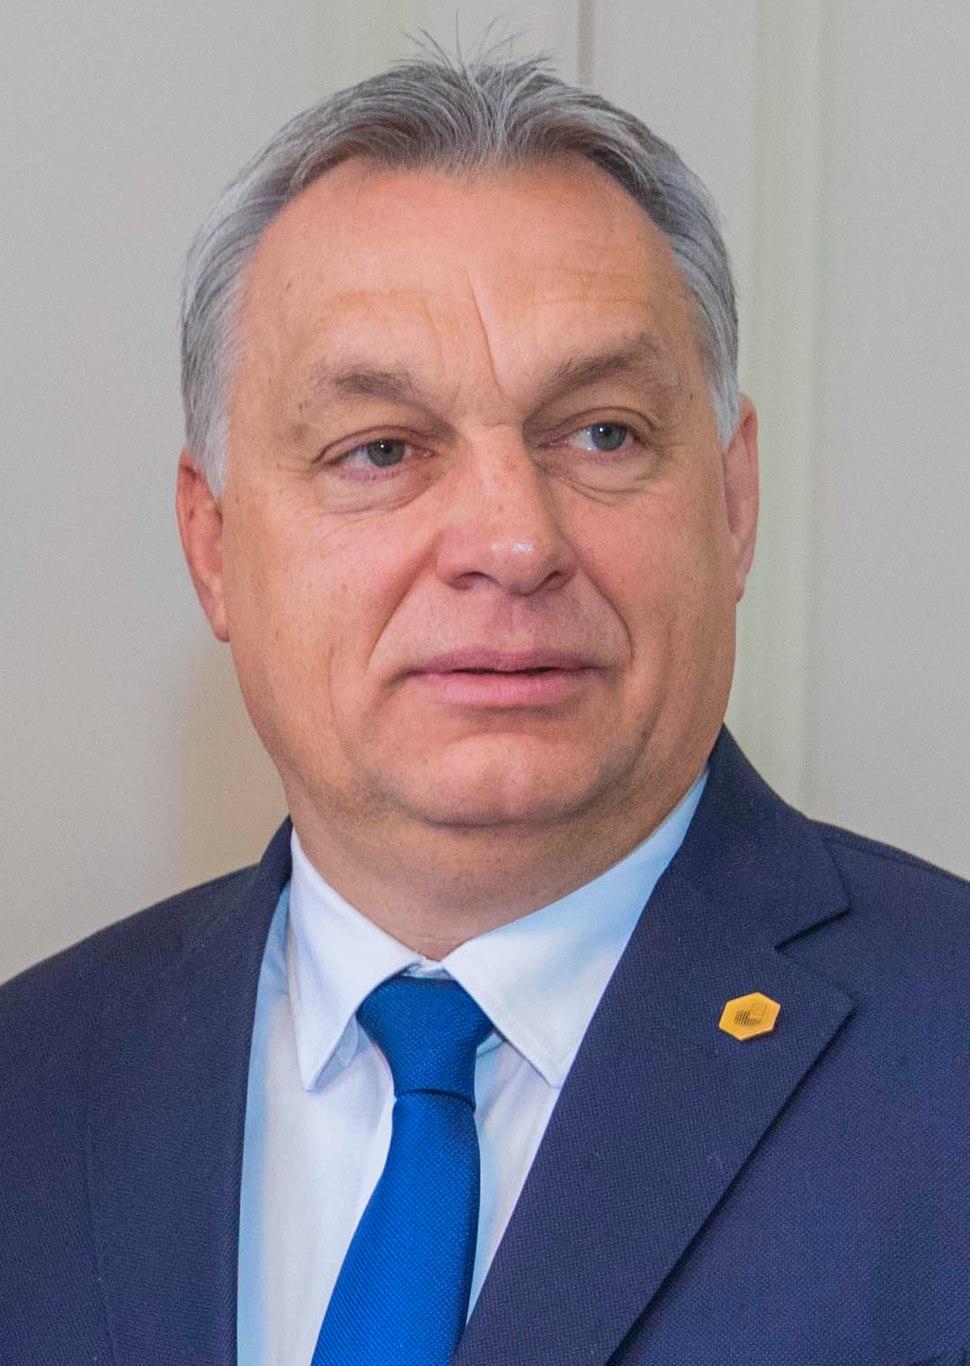 Viktor Orb%C3%A1n 2018